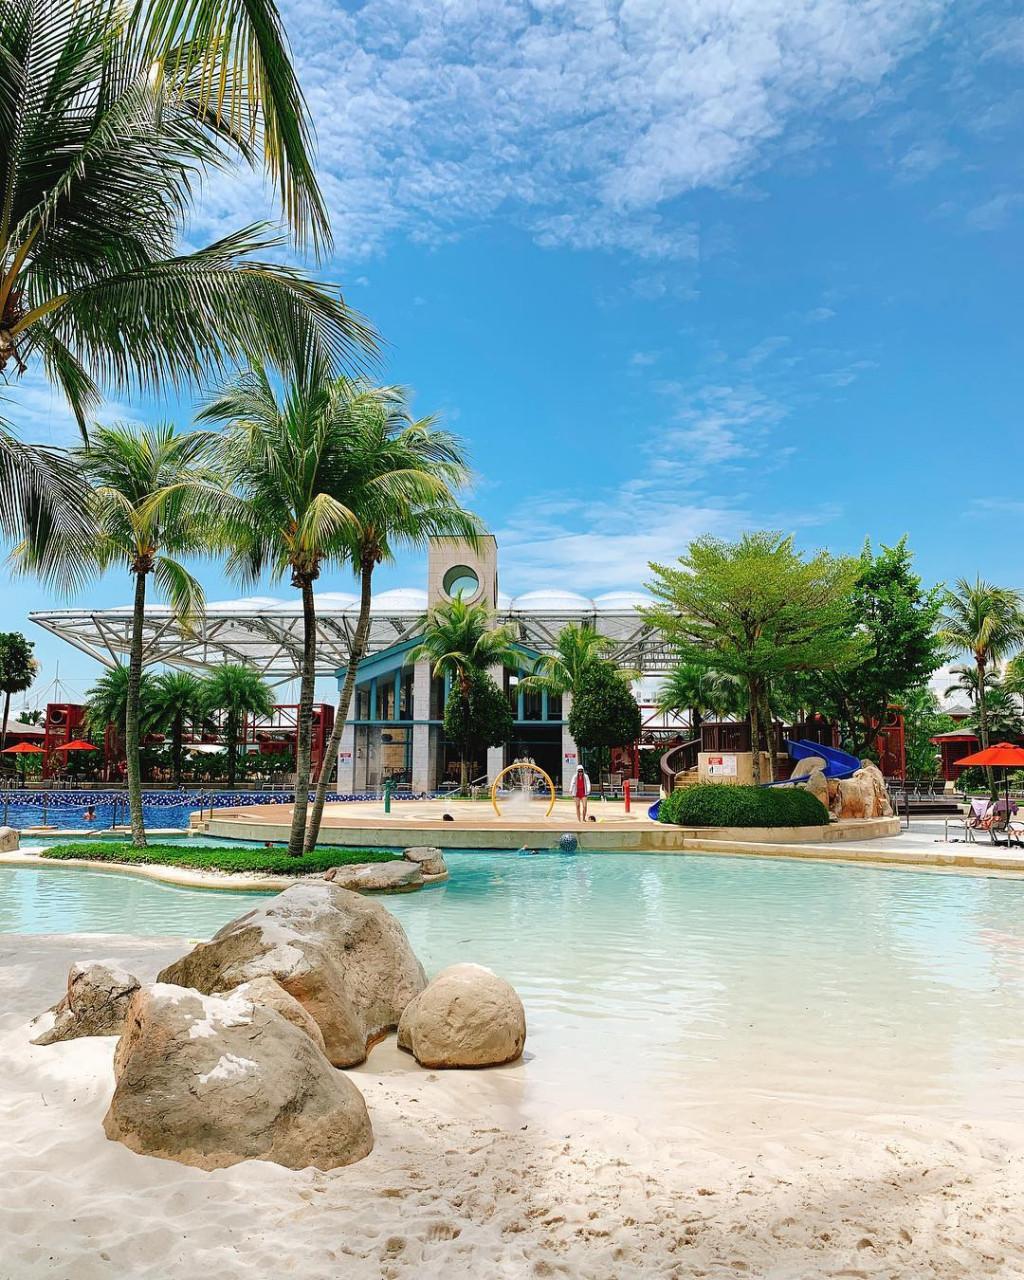 Hard Rock Hotel Singapore pool